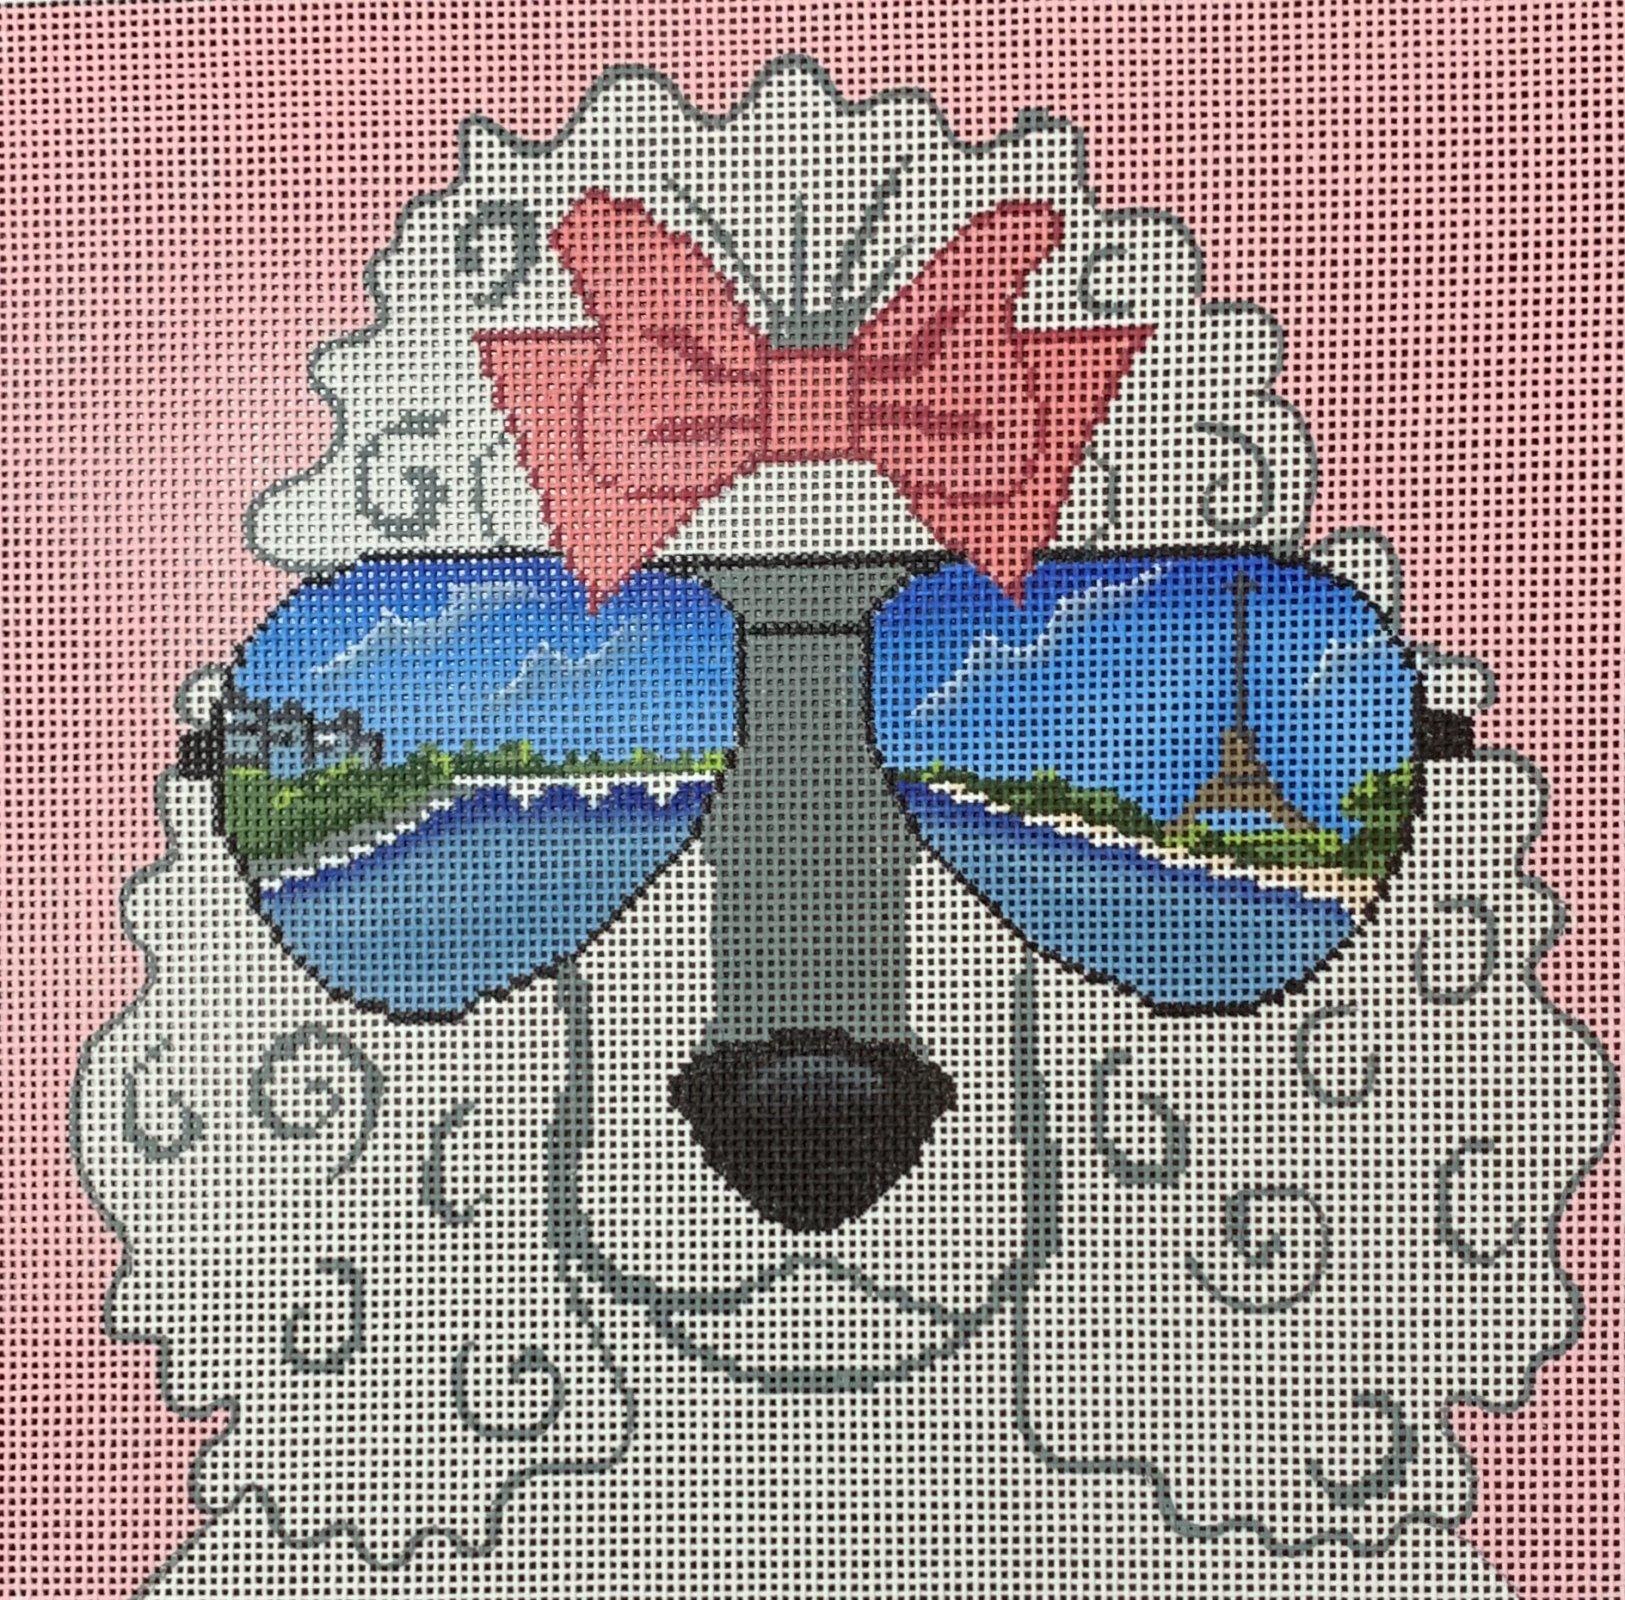 Sunglasses Poodle